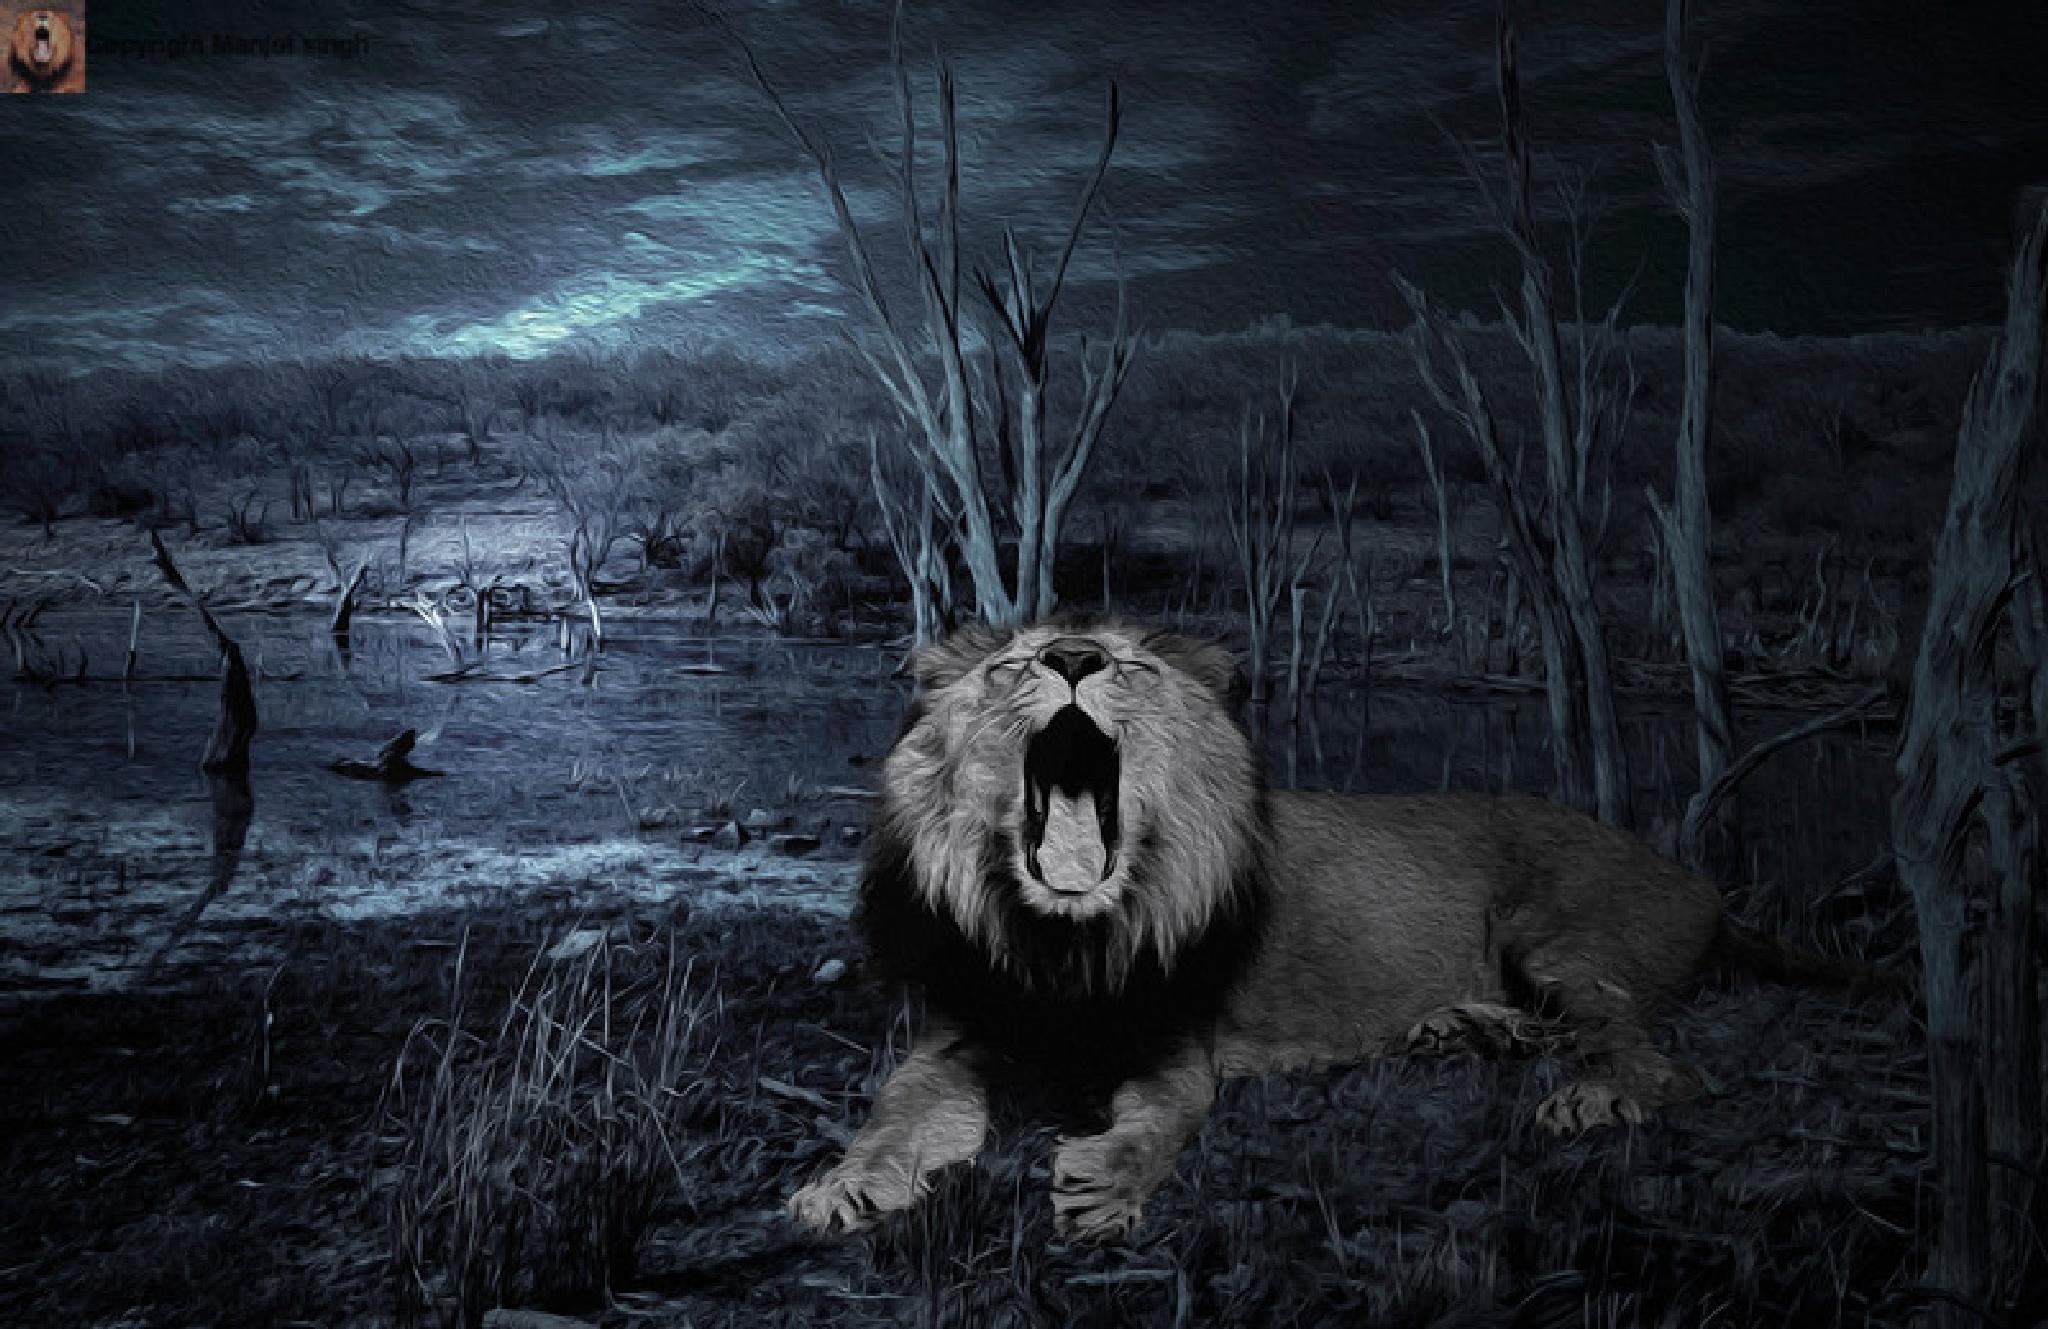 Roar of Lion  by Manjot Singh Sachdeva